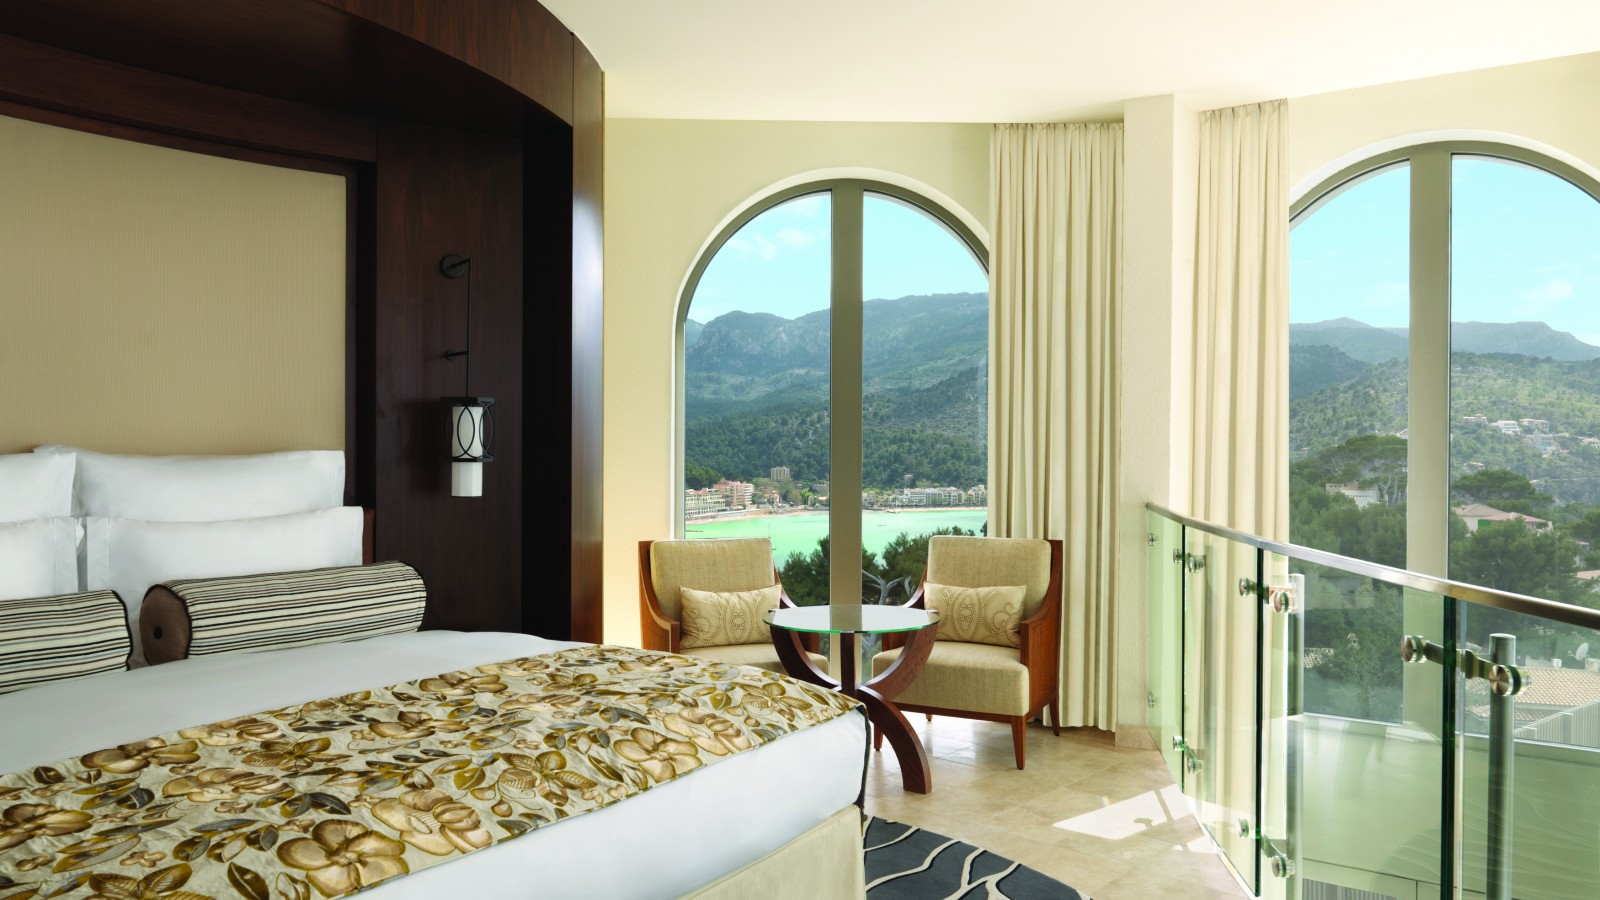 Jumeirah Port Soller Hotel